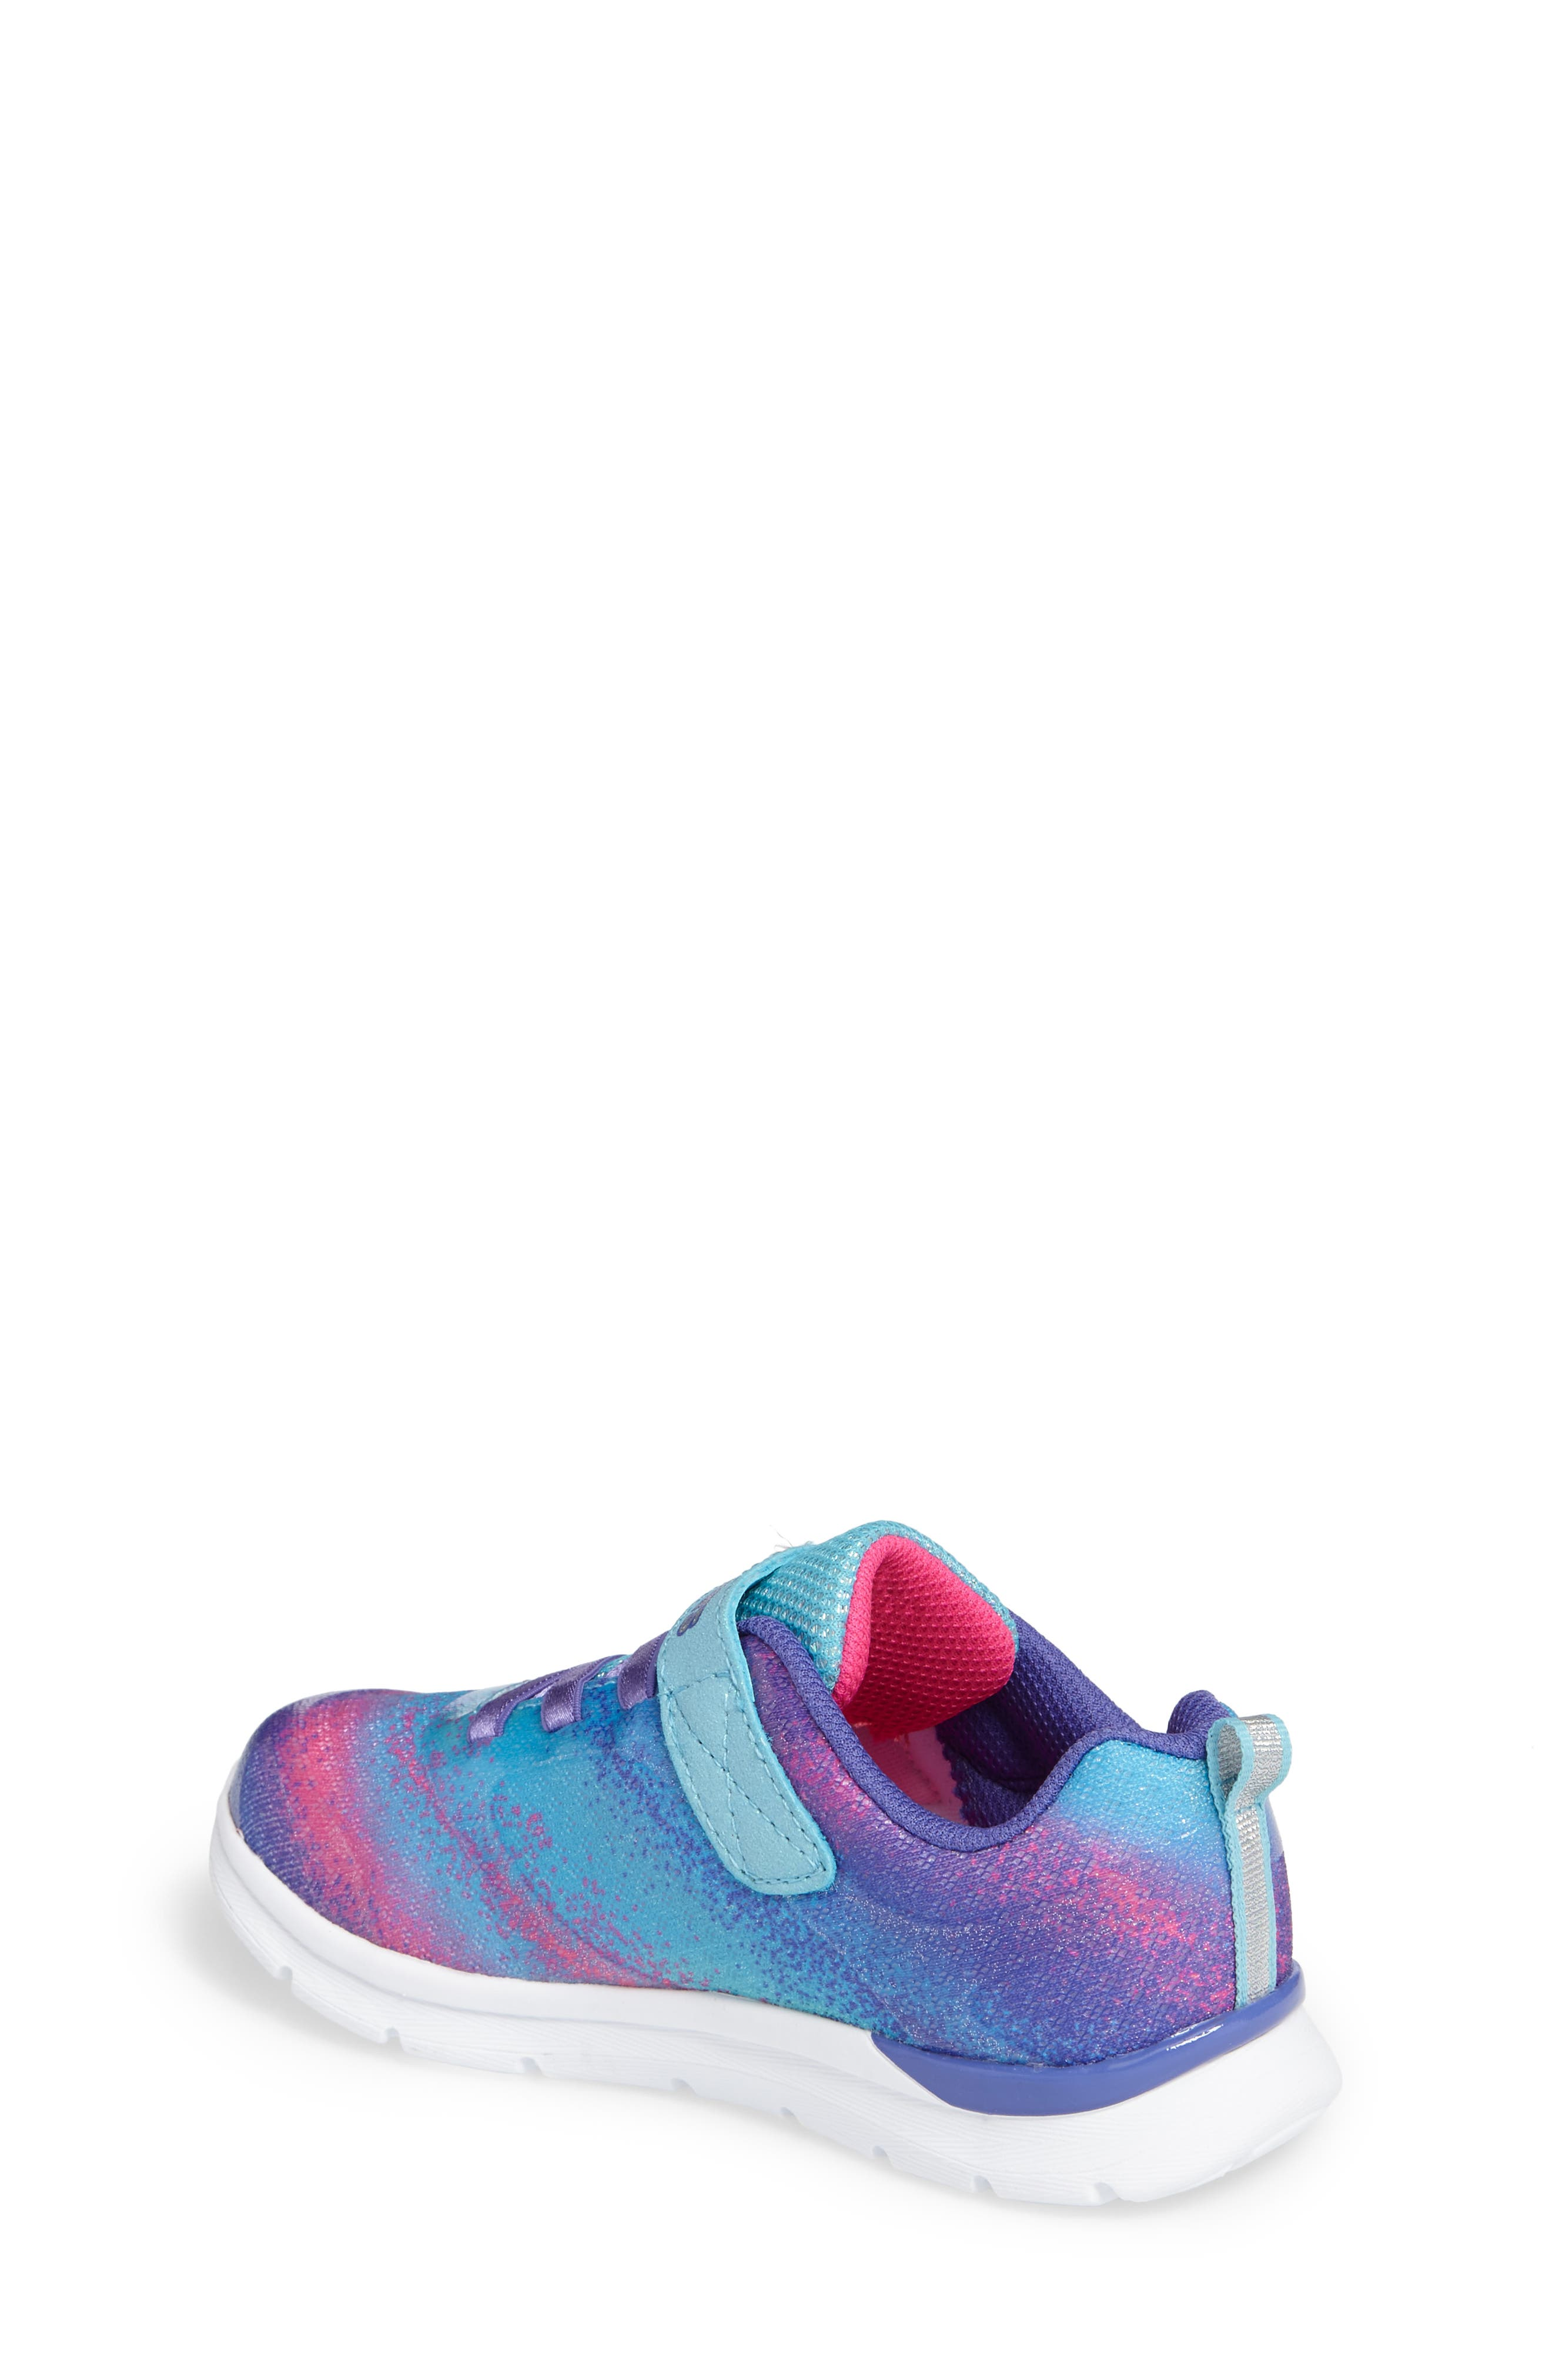 Alternate Image 2  - SKECHERS Skech-Lite Colorful Cutie Sneaker (Walker & Toddler)